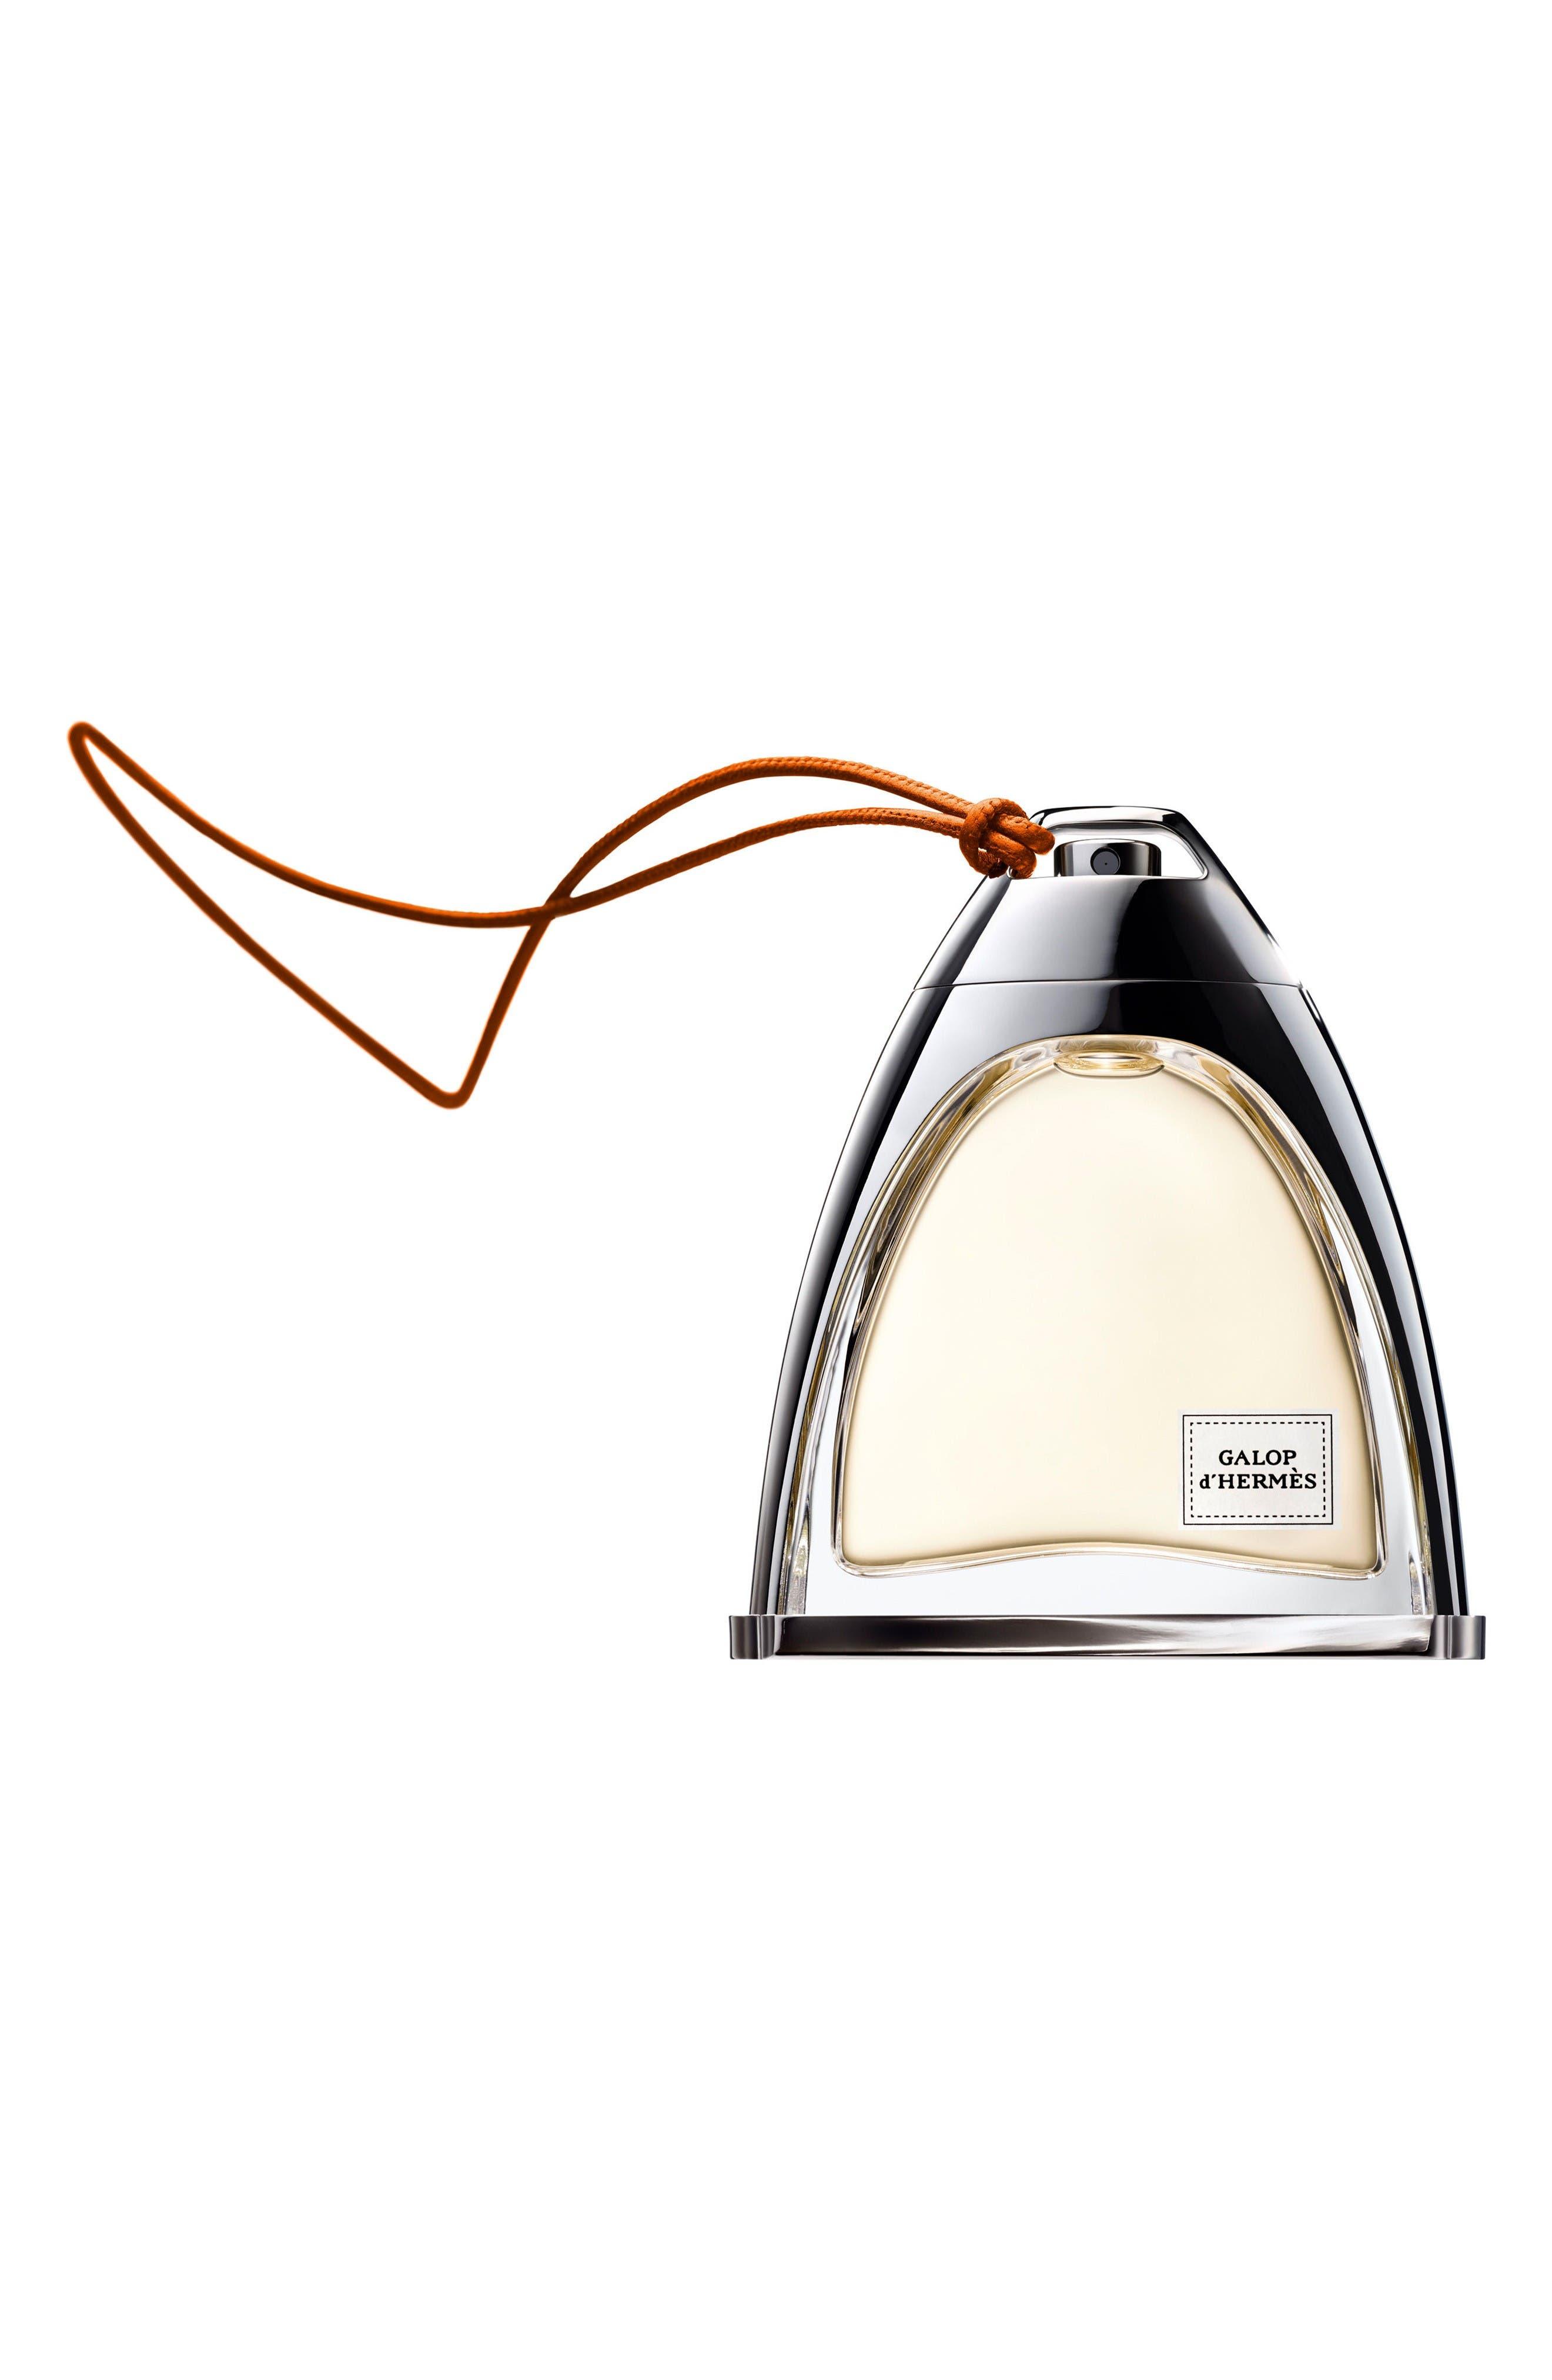 Main Image - Hermès Galop d'Hermès - Parfum